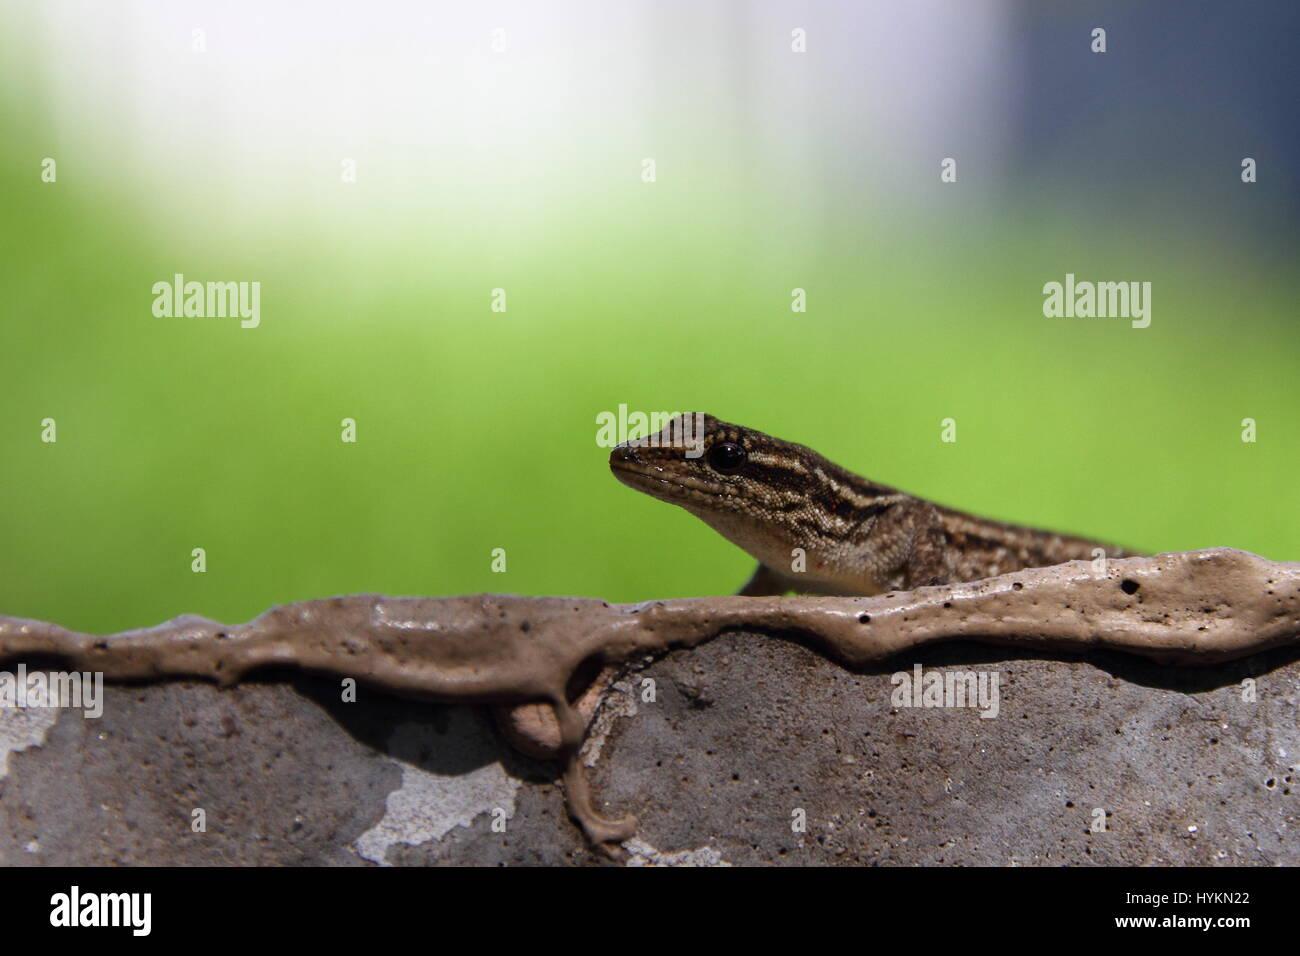 Wildlife in urban spaces - Stock Image